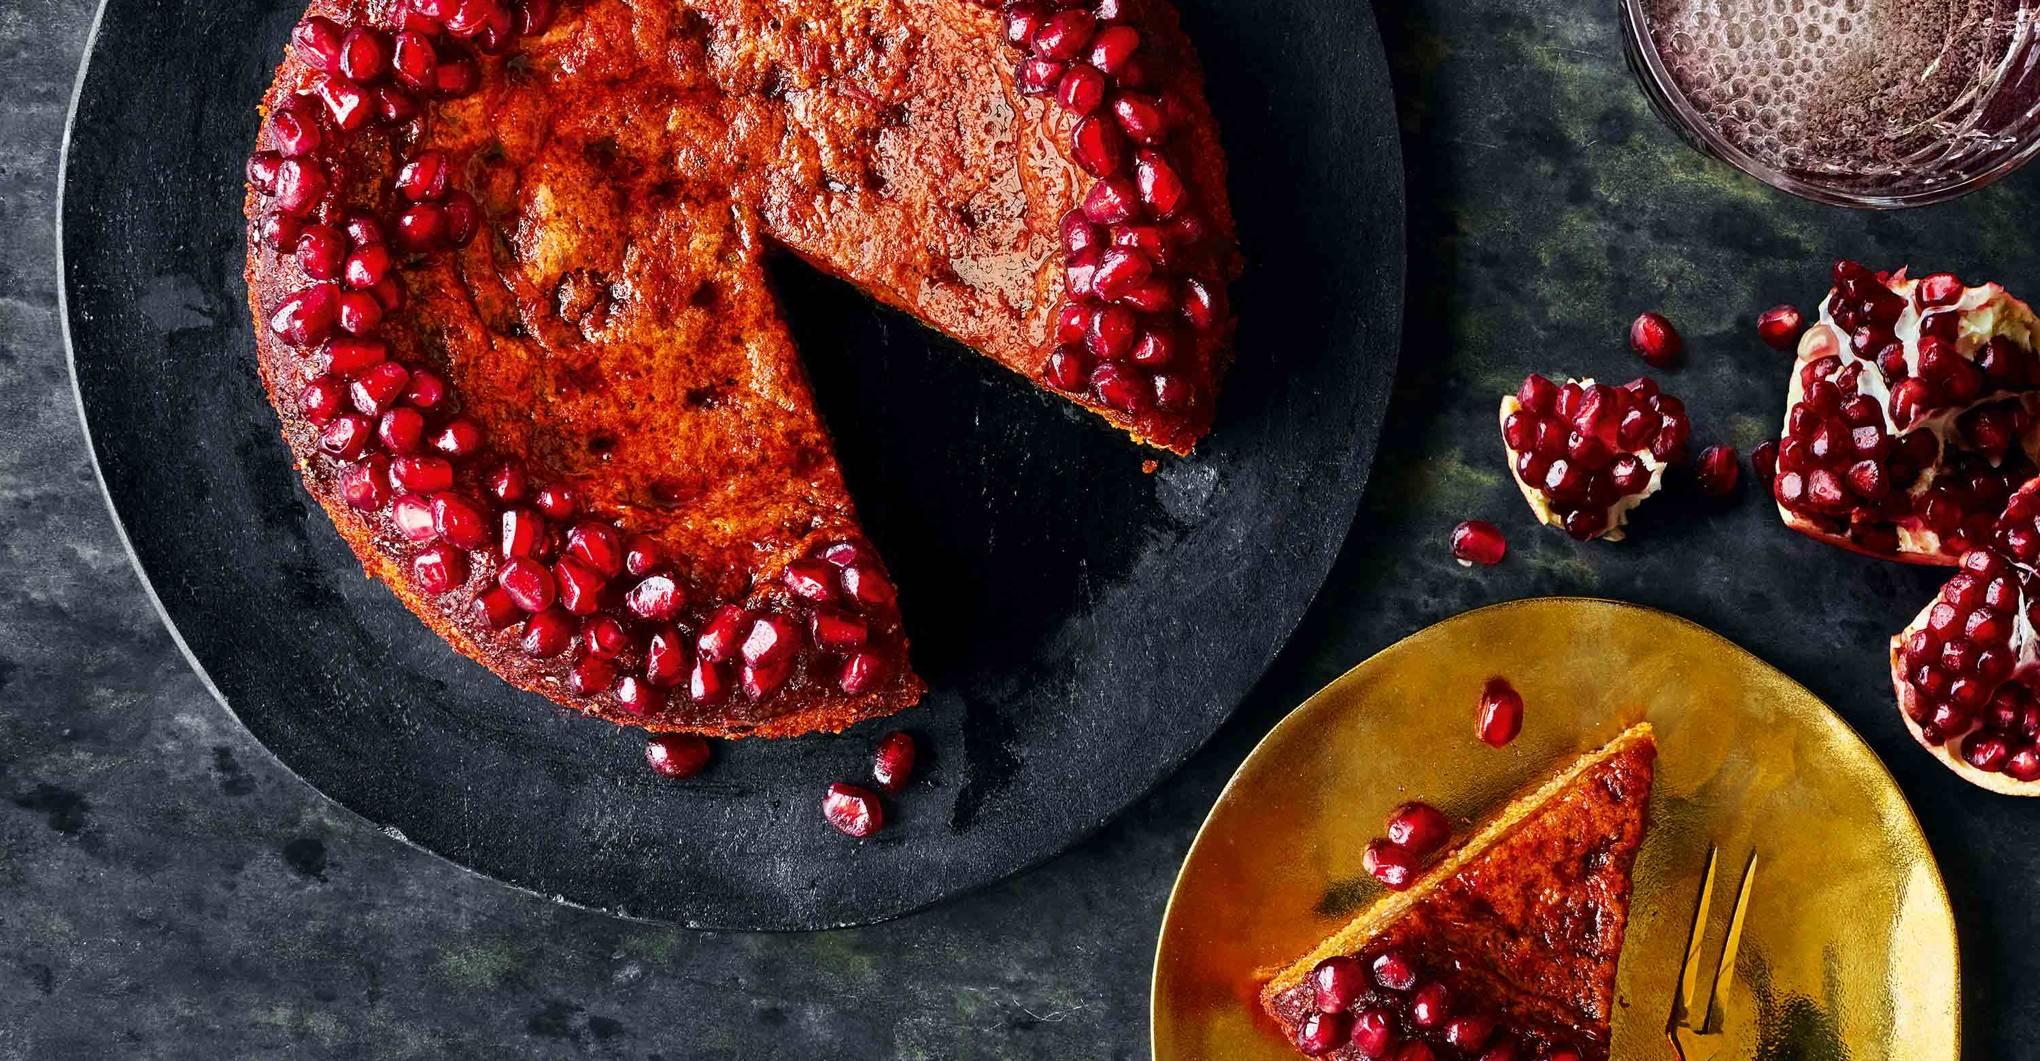 How to make pomegranate and orange cake